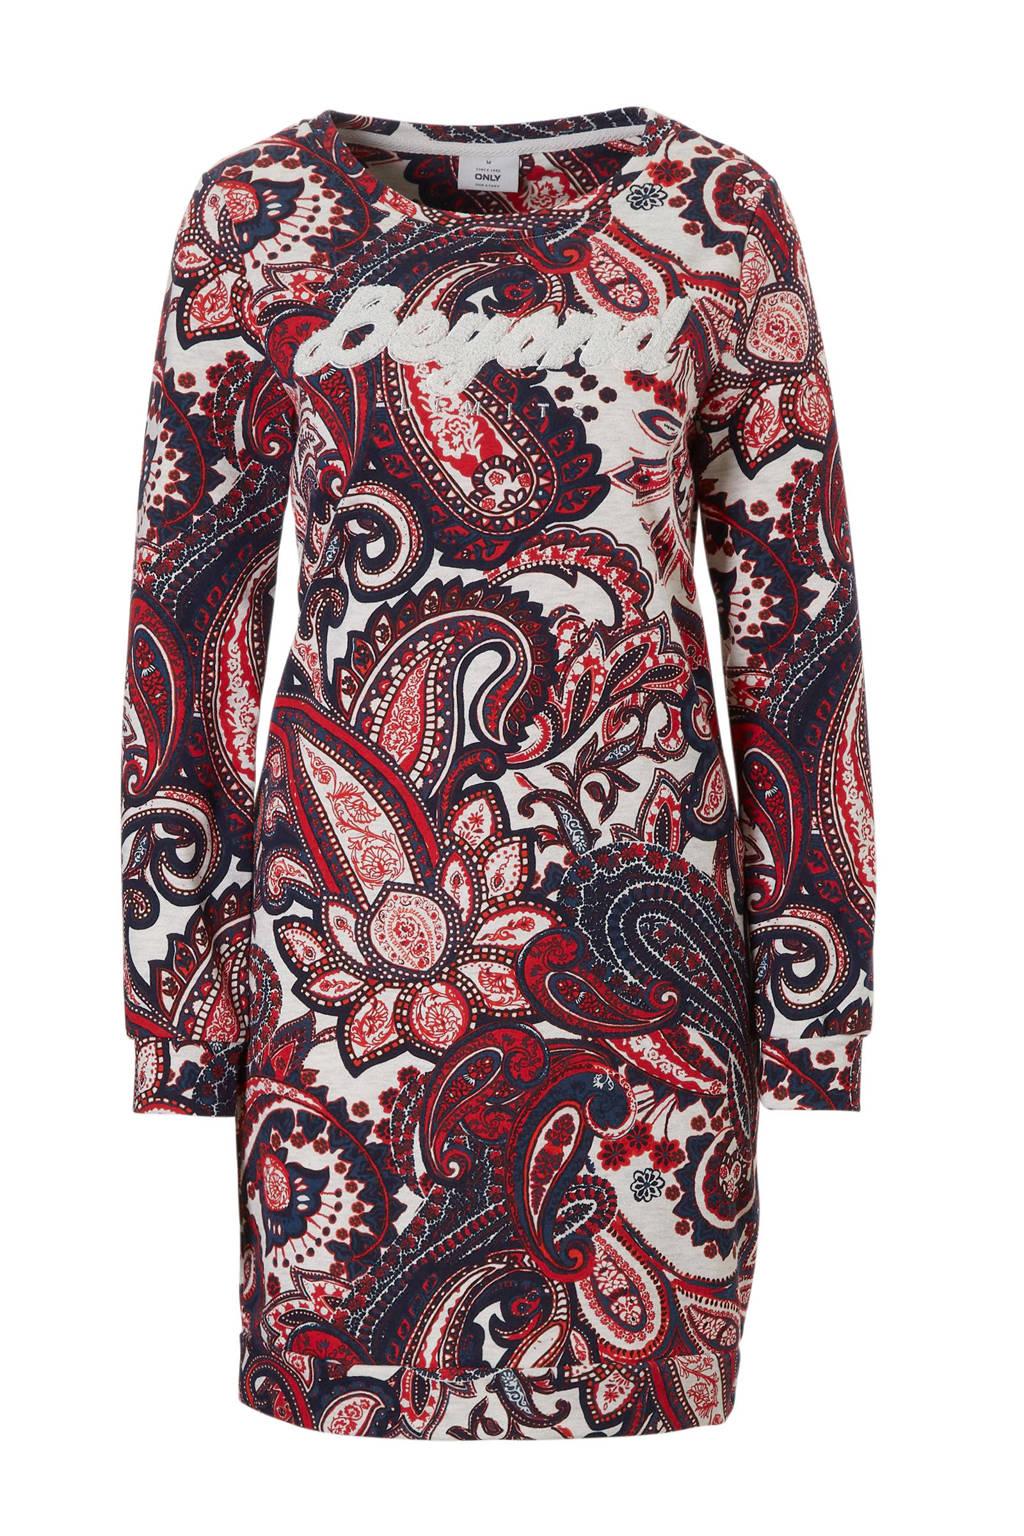 ONLY jurk met paisley print, Rood/wit/zwart